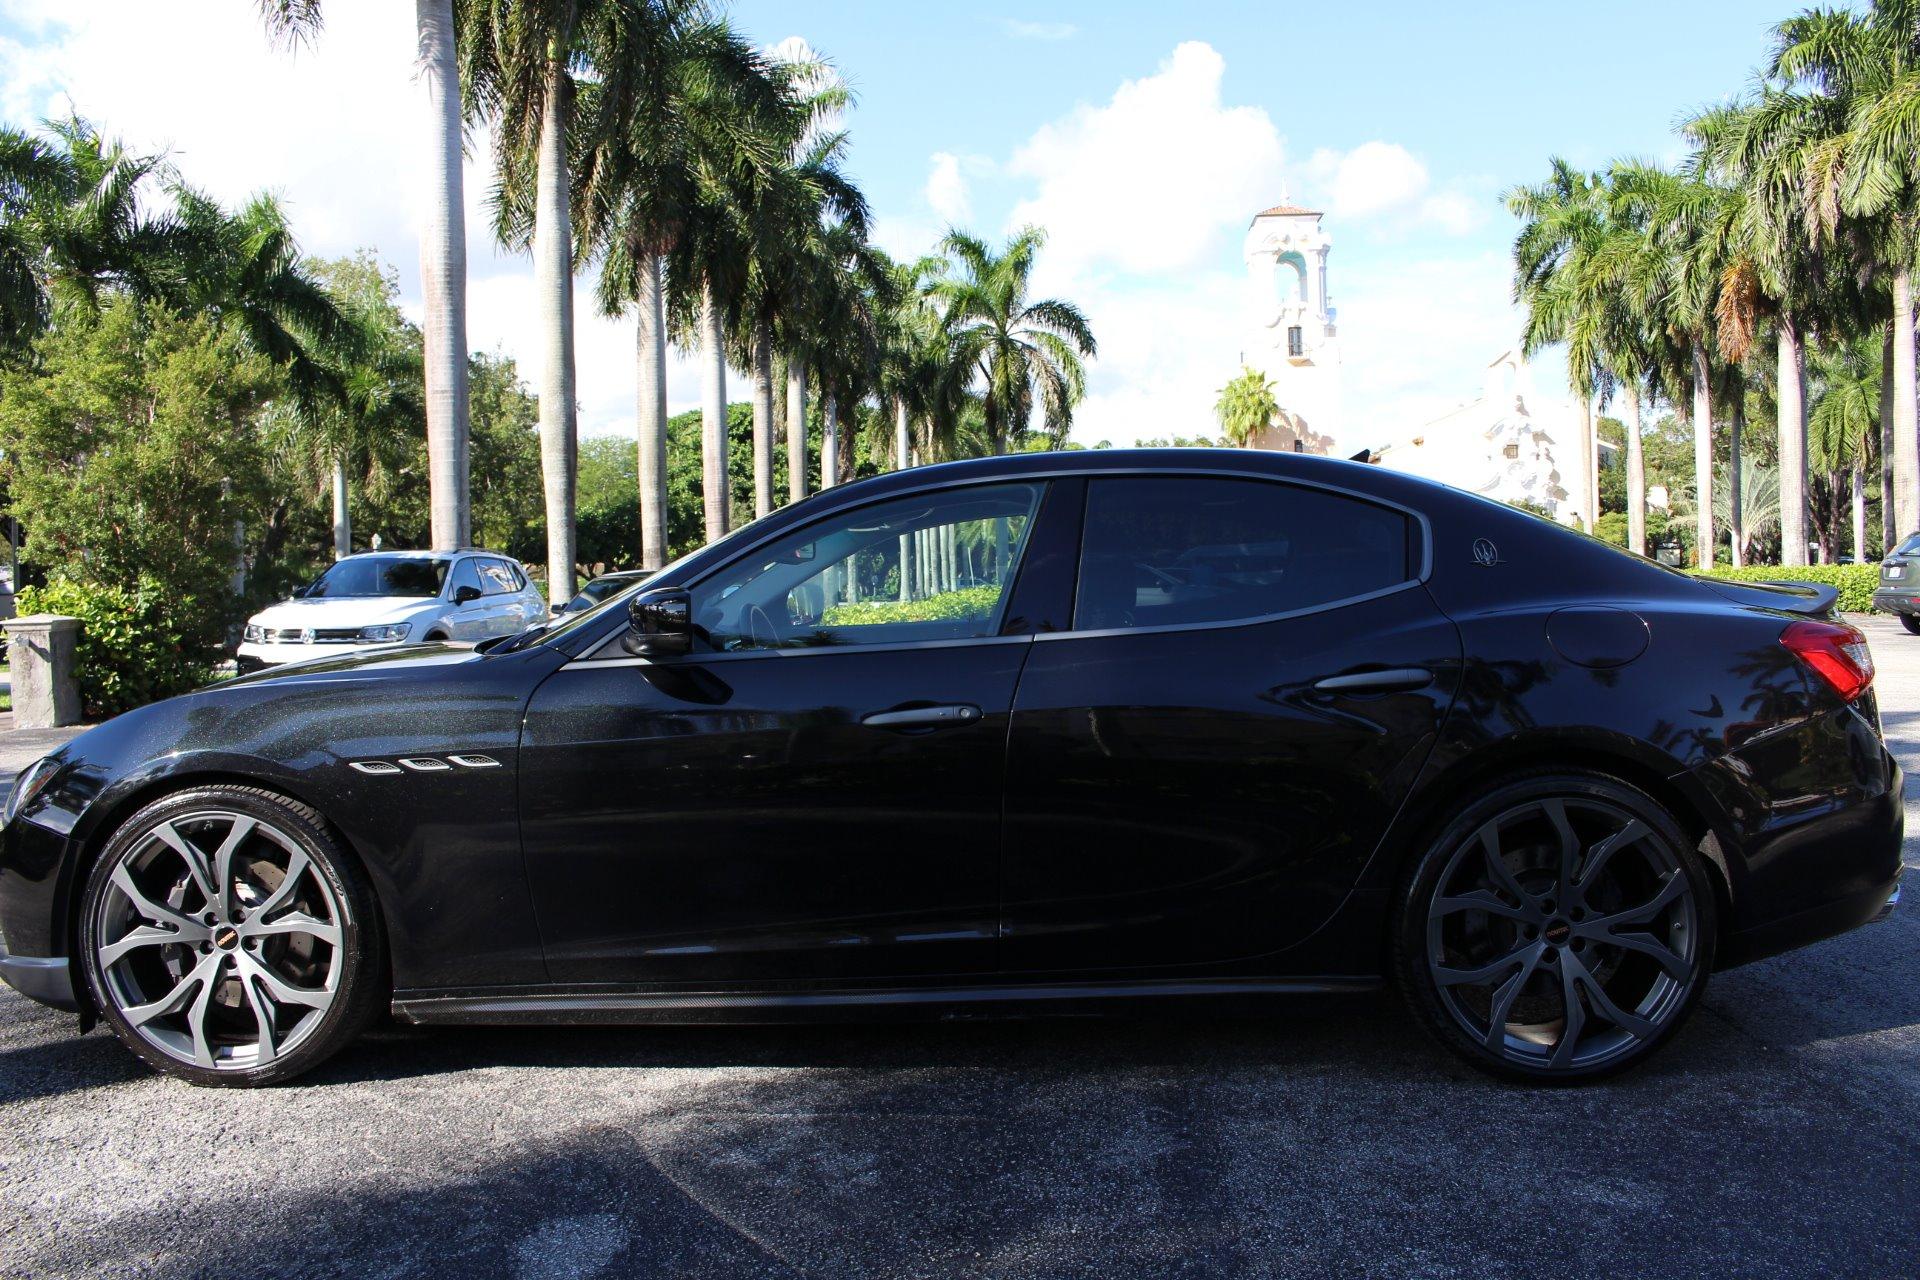 Used 2015 Maserati Ghibli SQ4 Novitec for sale Sold at The Gables Sports Cars in Miami FL 33146 3